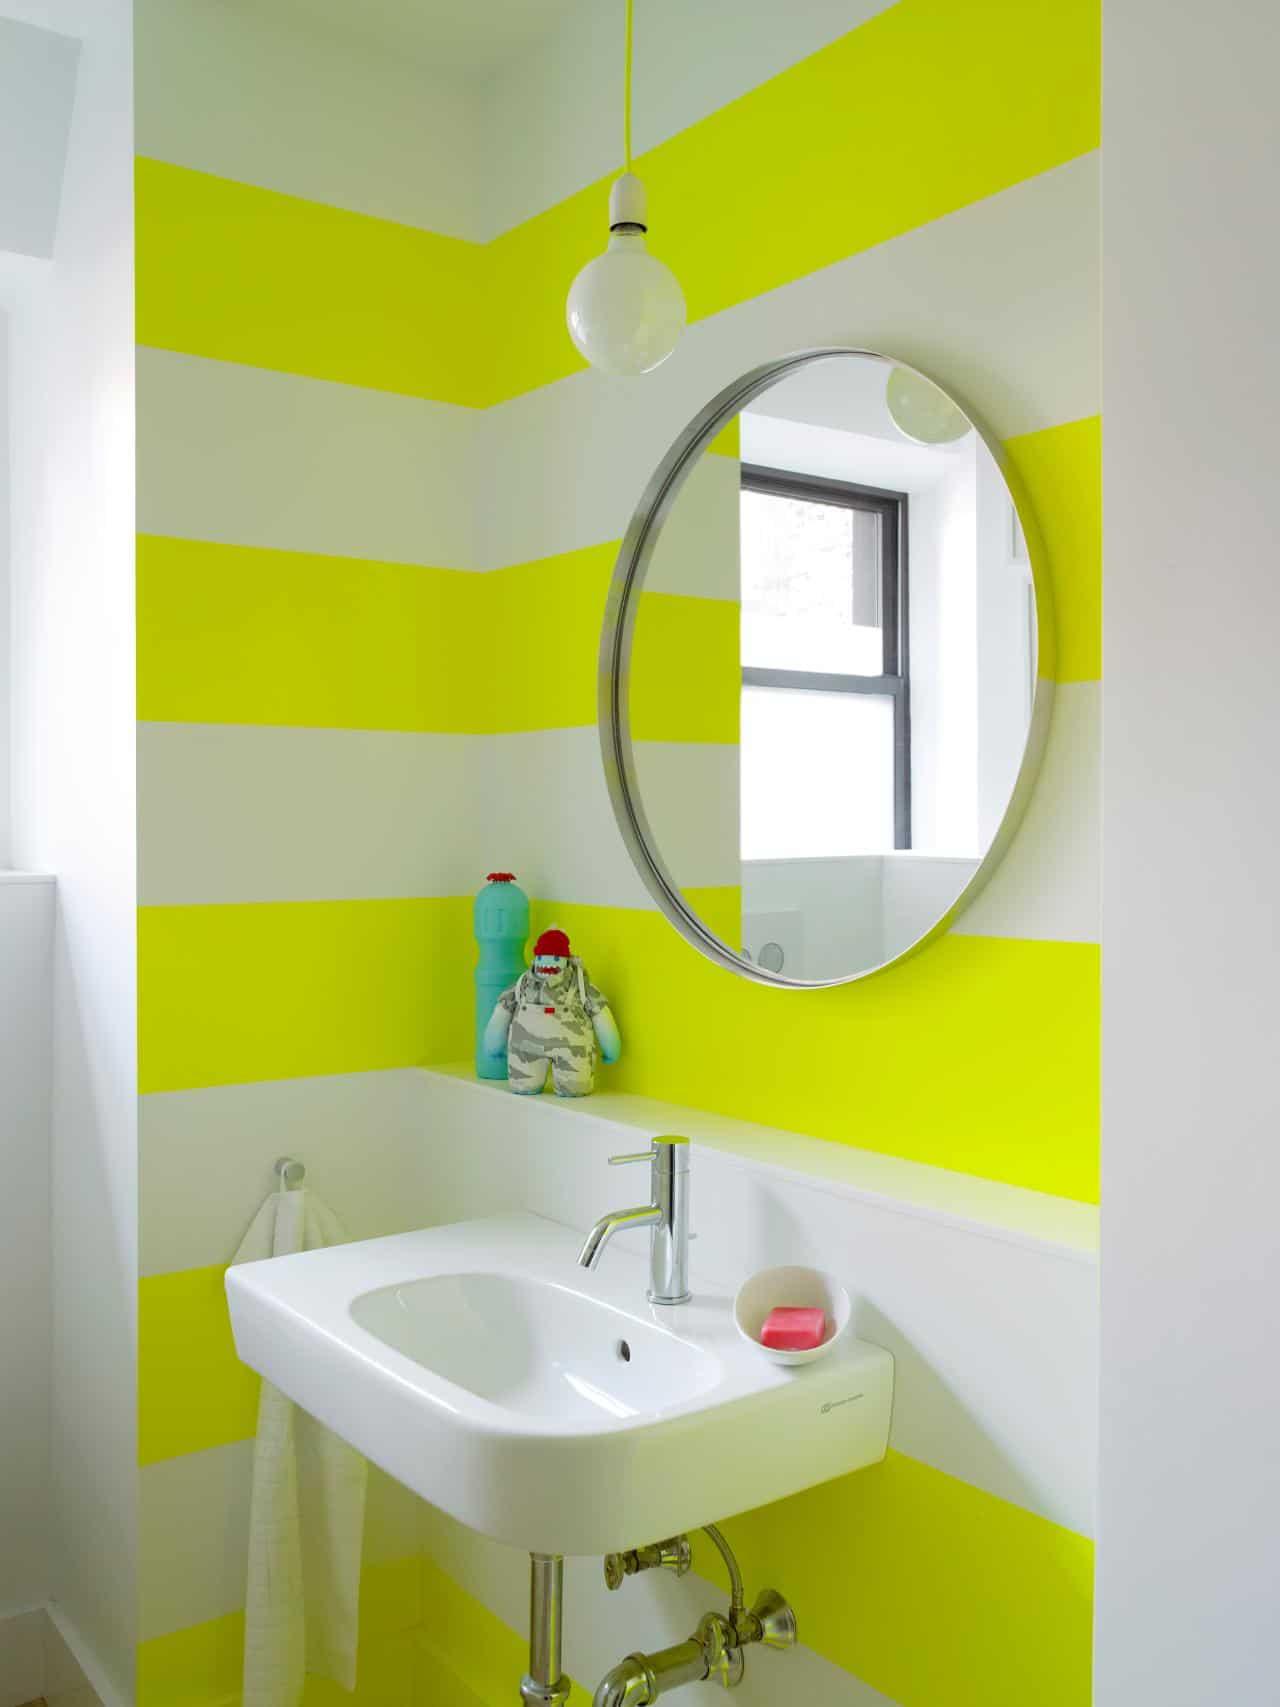 neon yellow walls